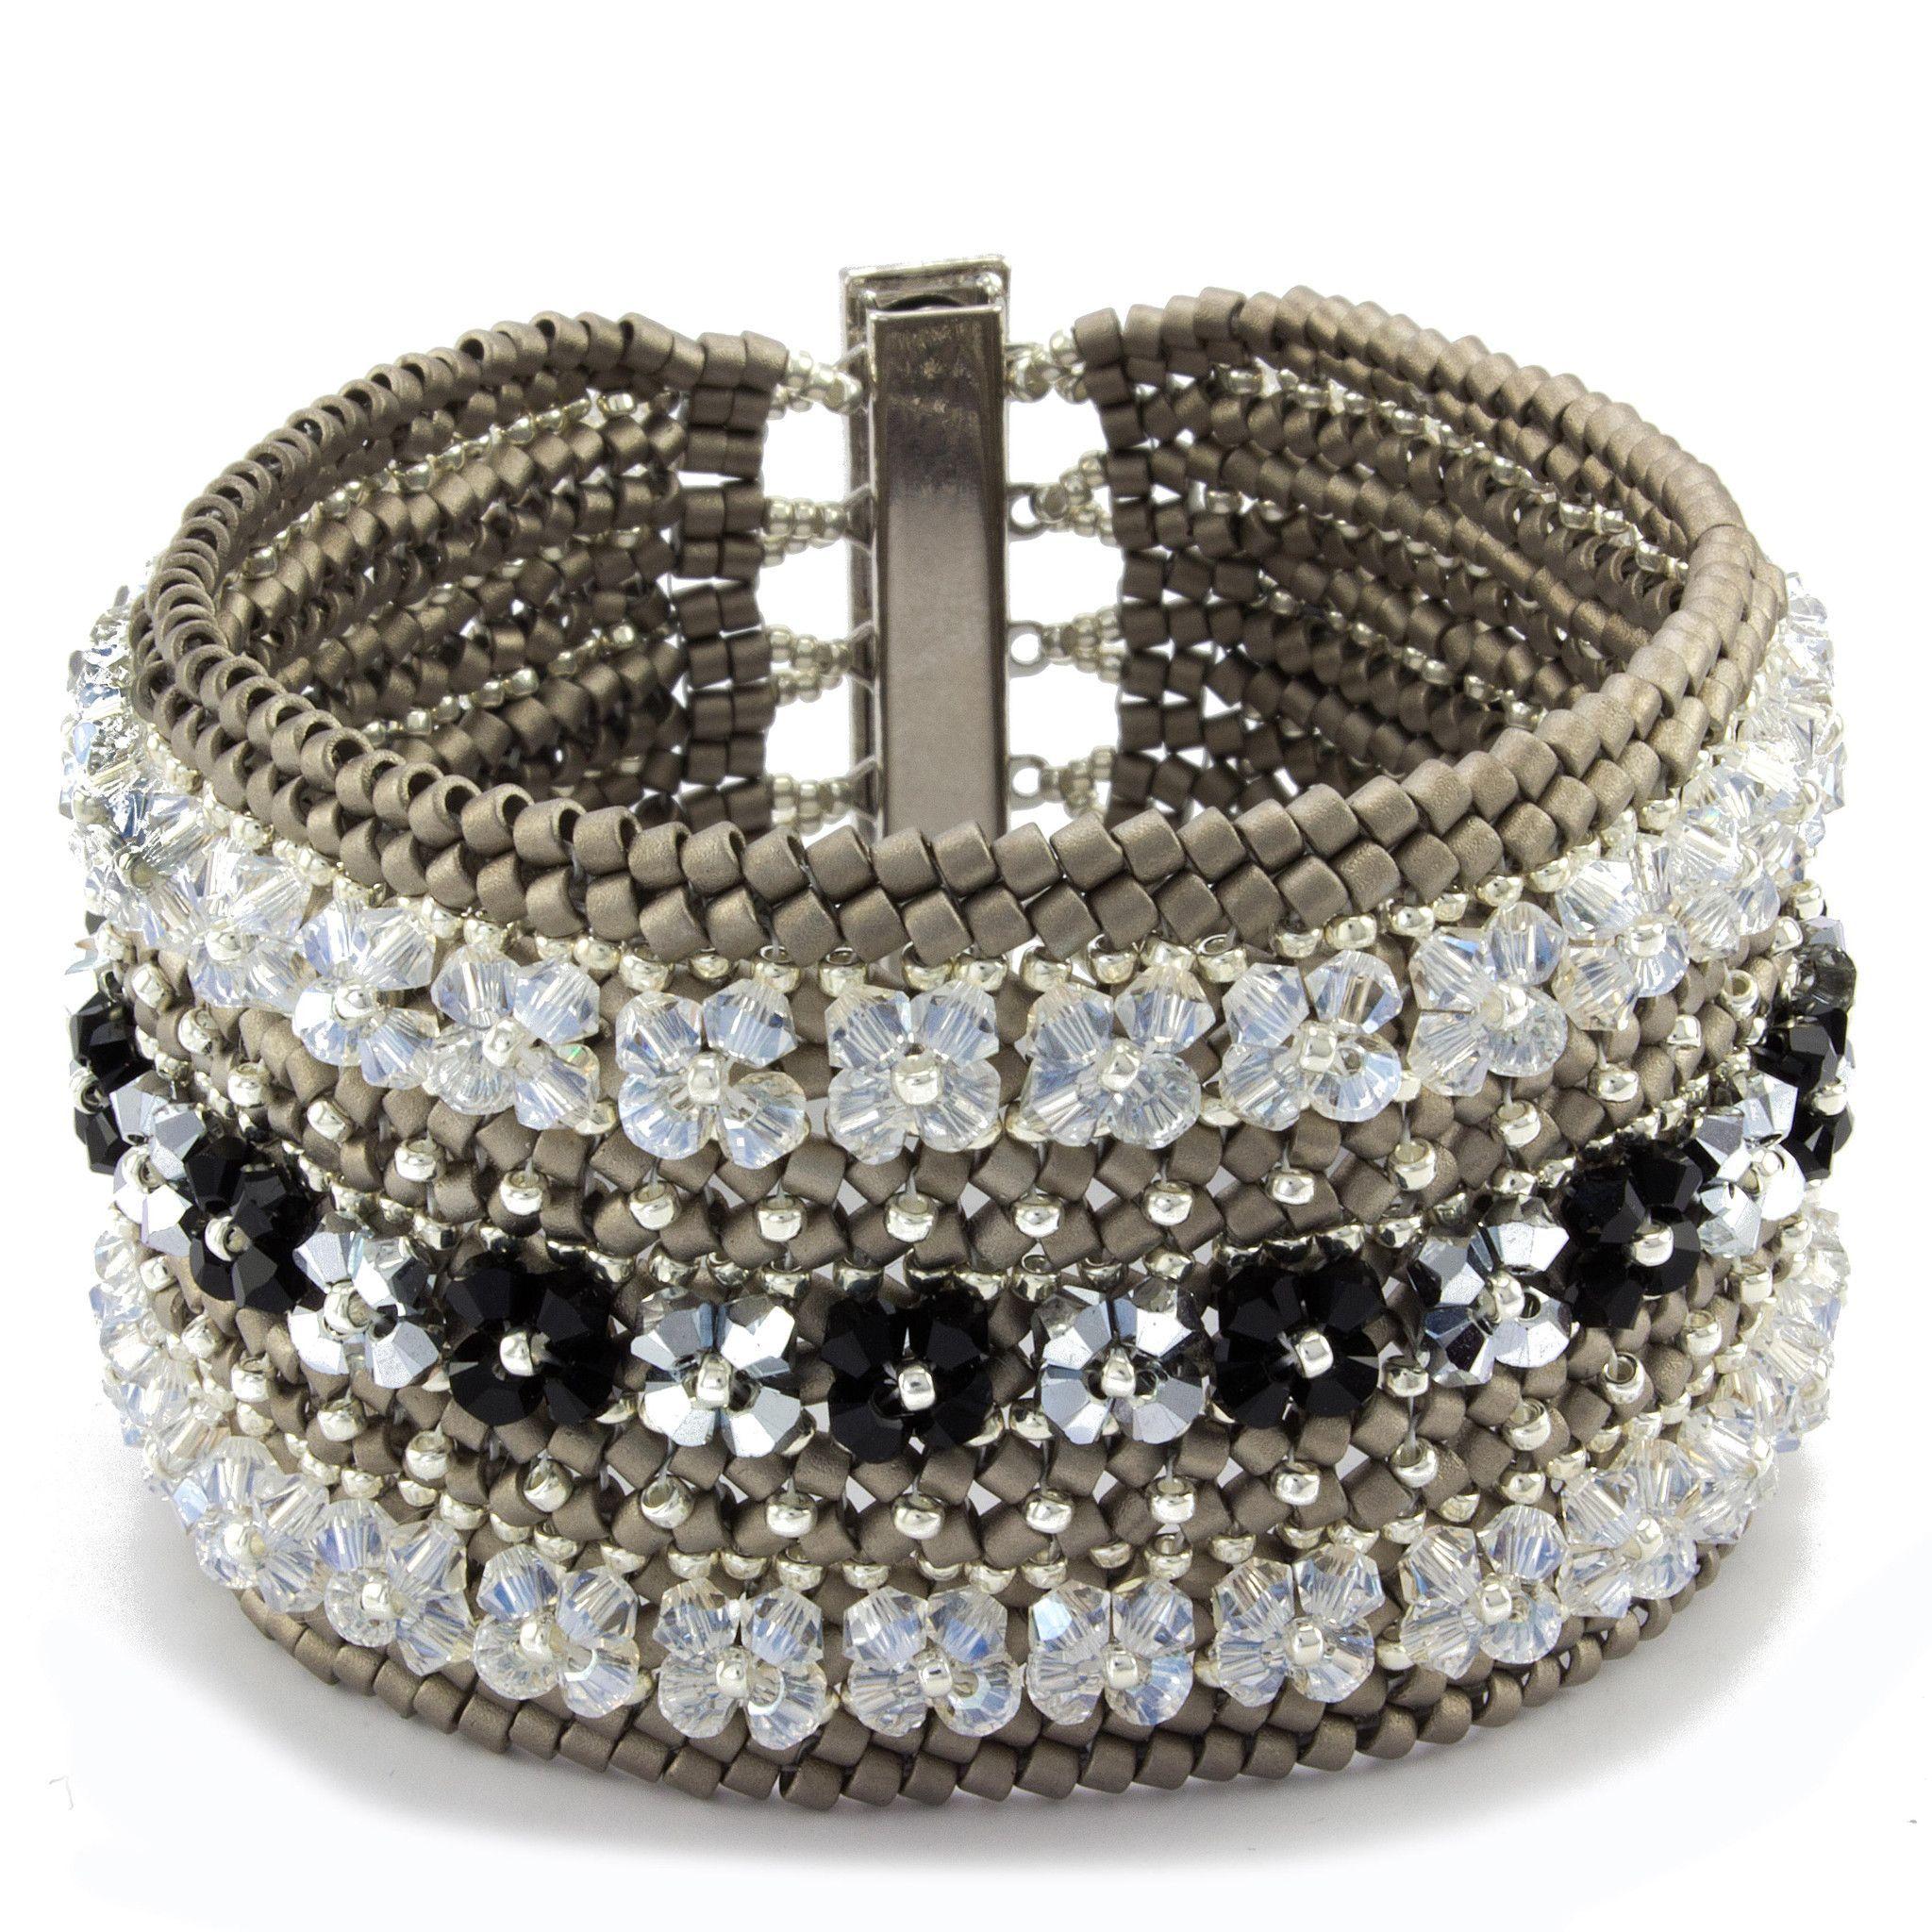 seasons of bracelet bead weaving kit bracelets